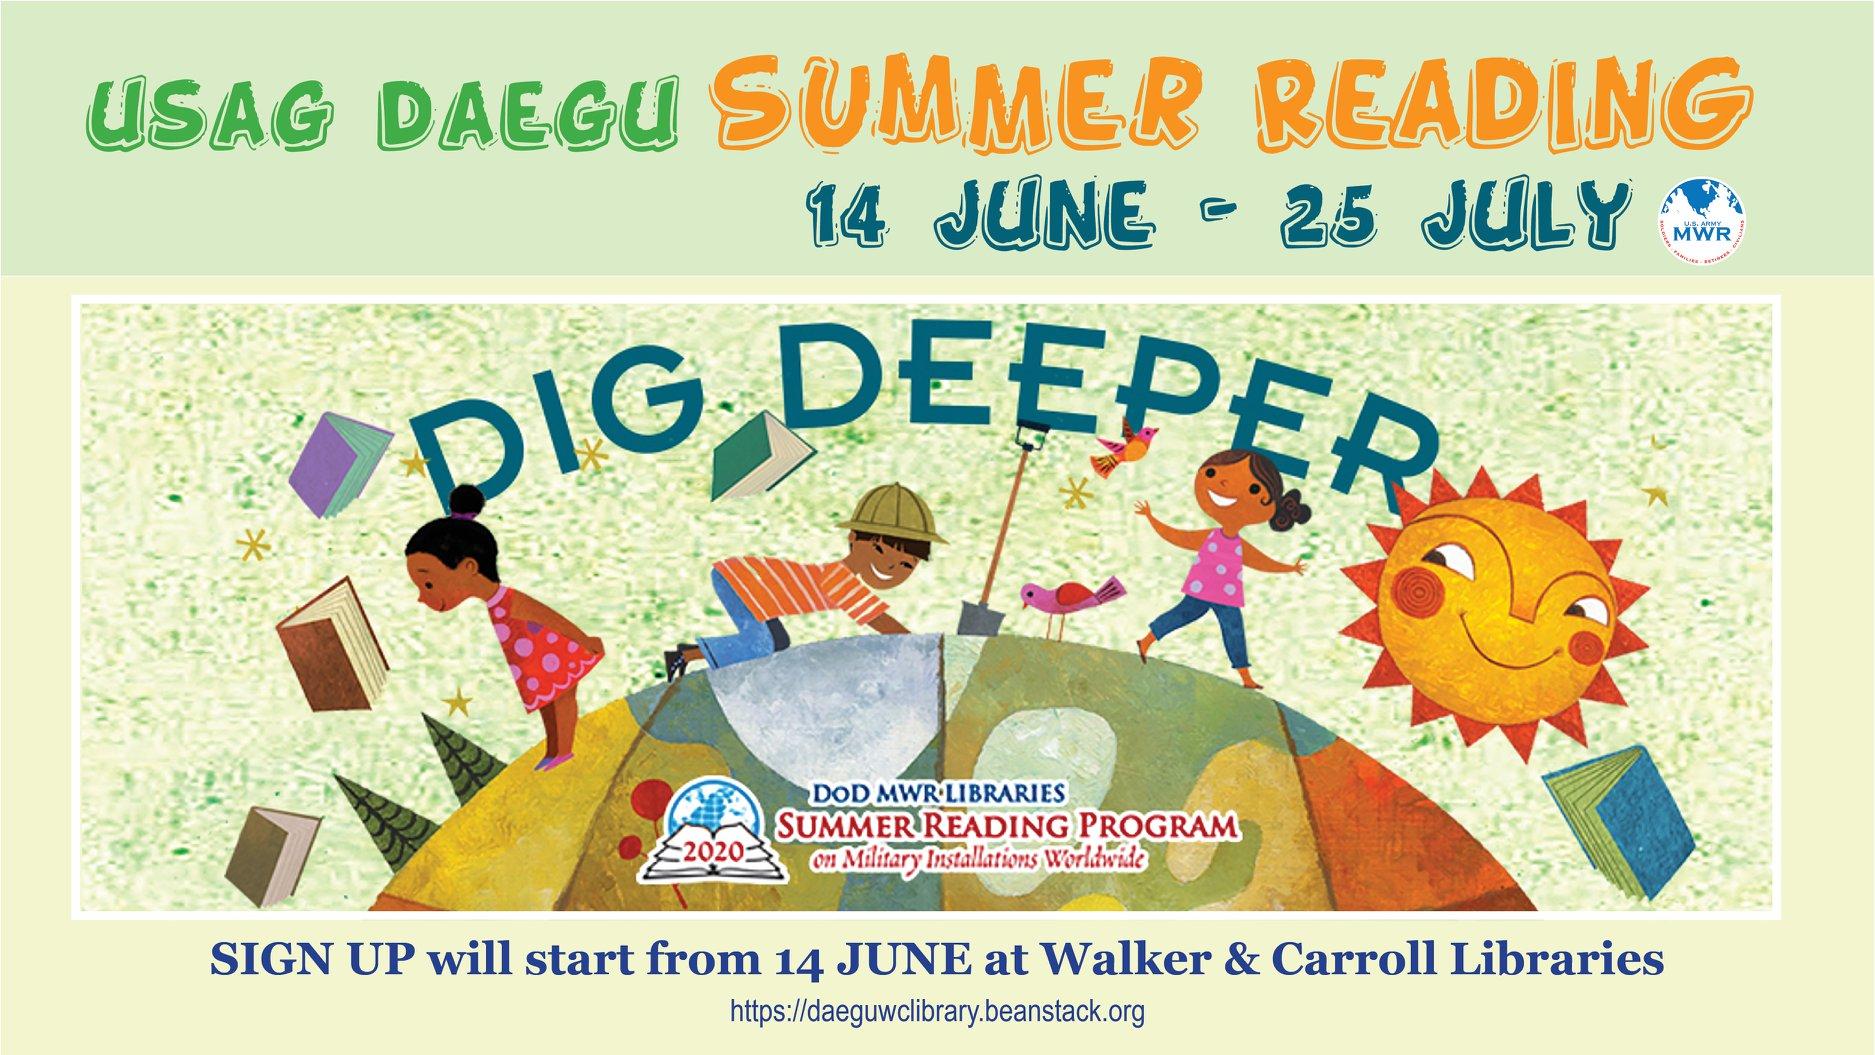 USAG DAEGU Summer Reading